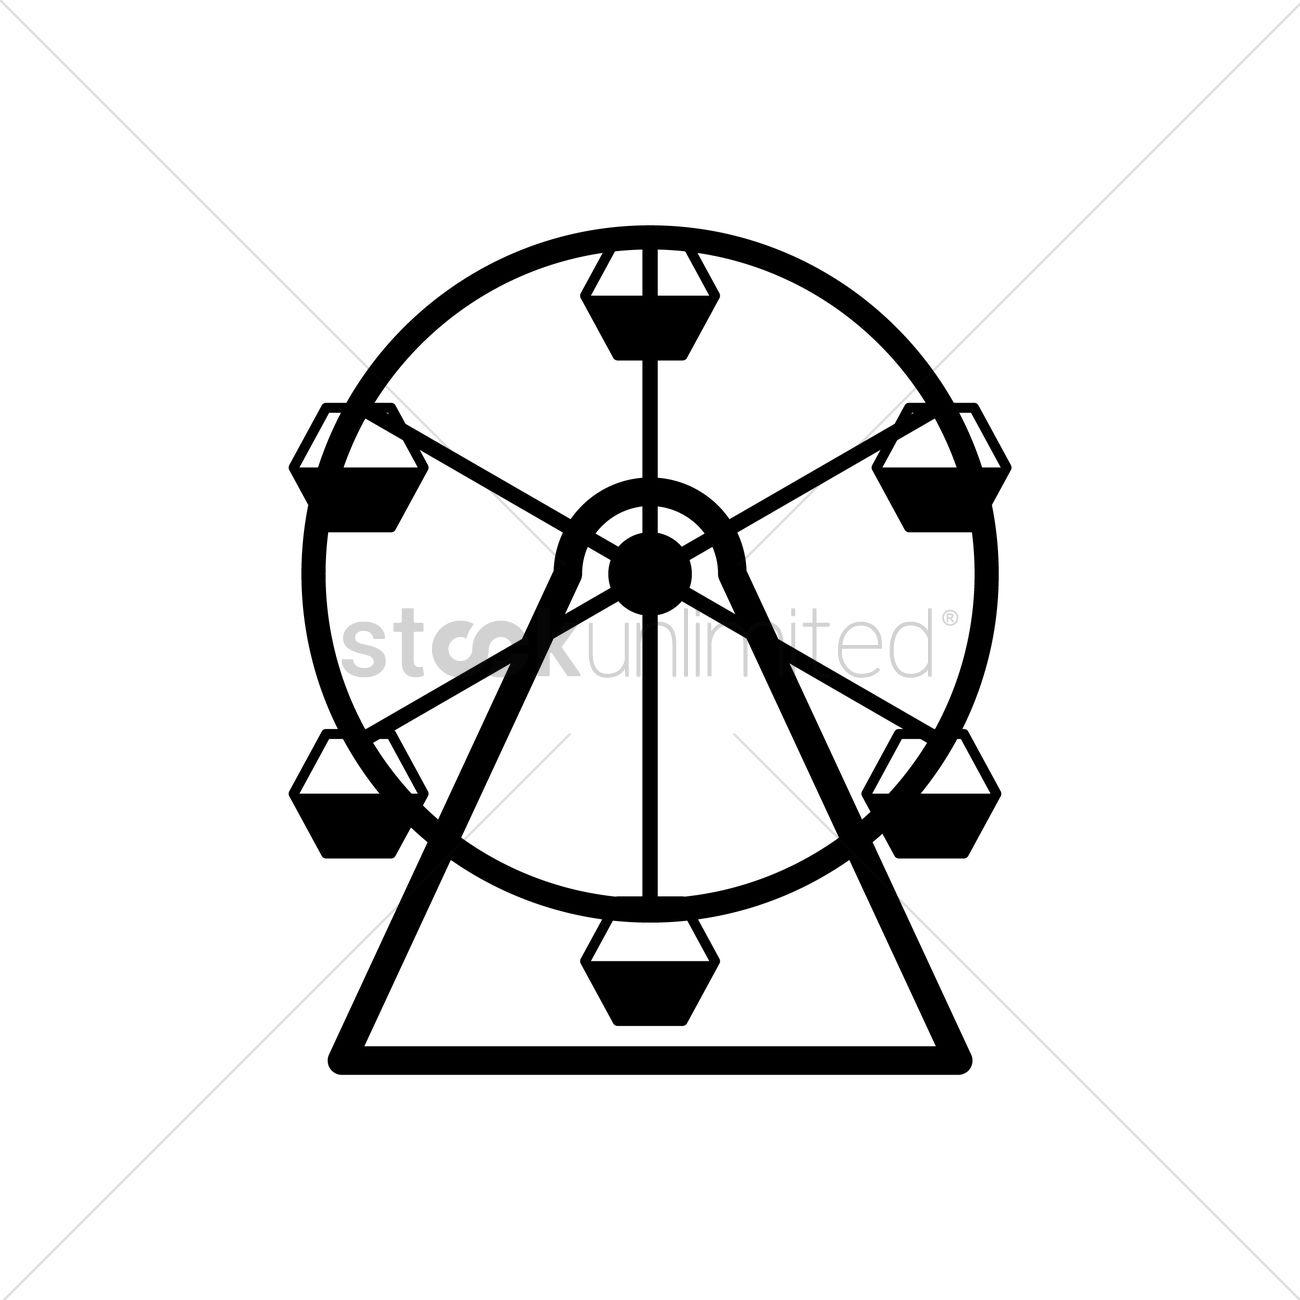 Ferris Wheel Vector Image 1493805 Stockunlimited